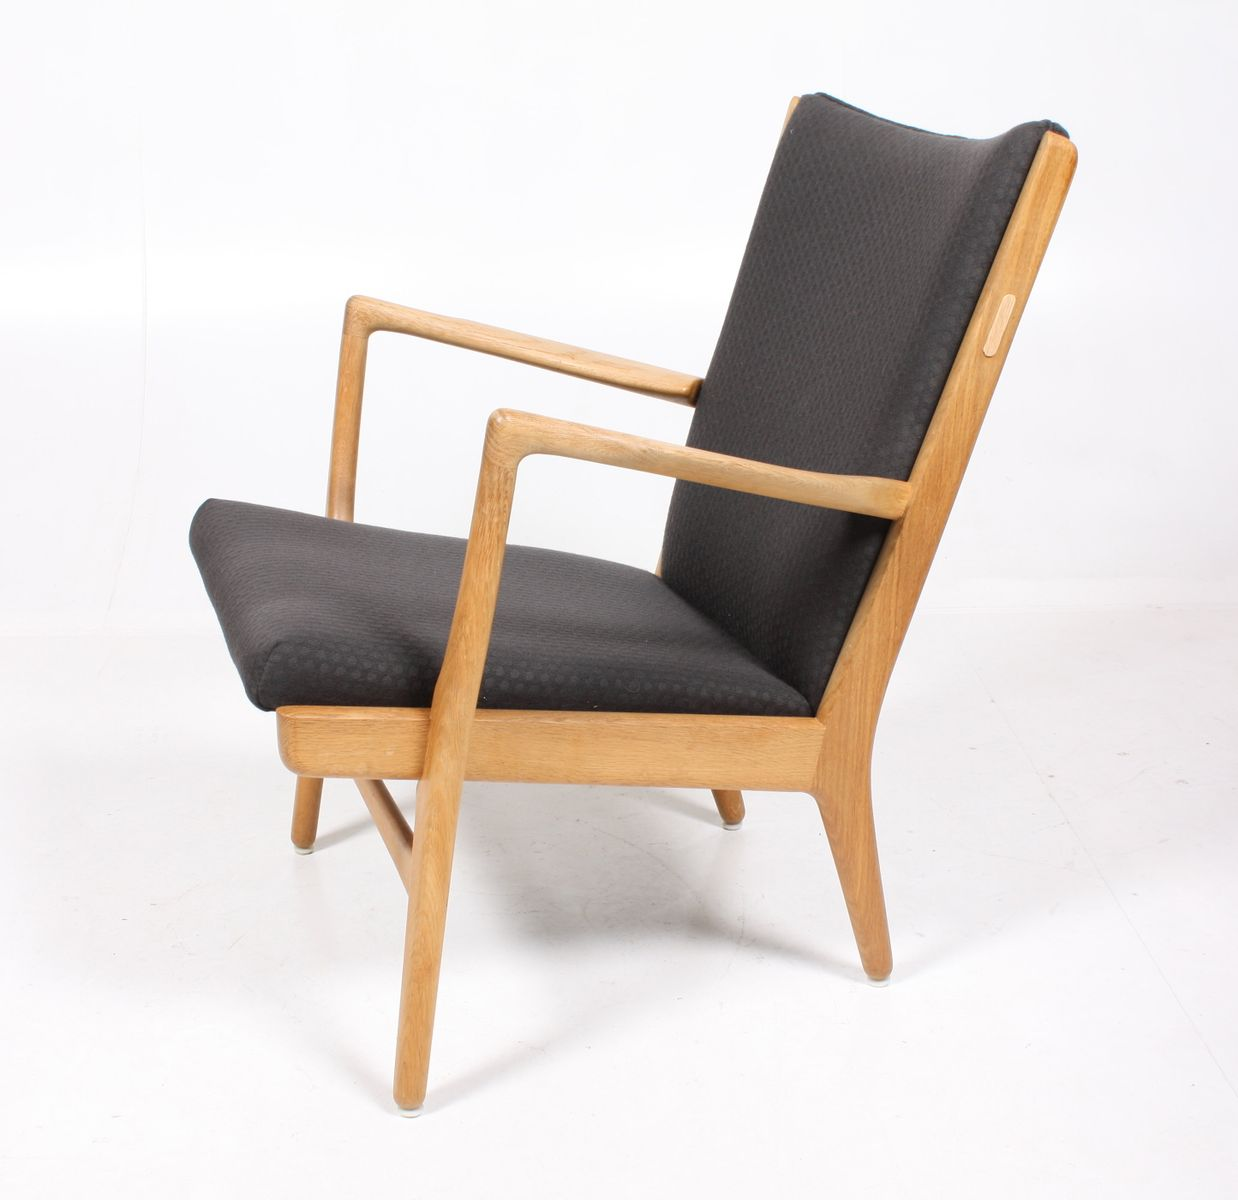 ap16 easy chair by hans j wegner for ap stolen for sale at pamono. Black Bedroom Furniture Sets. Home Design Ideas